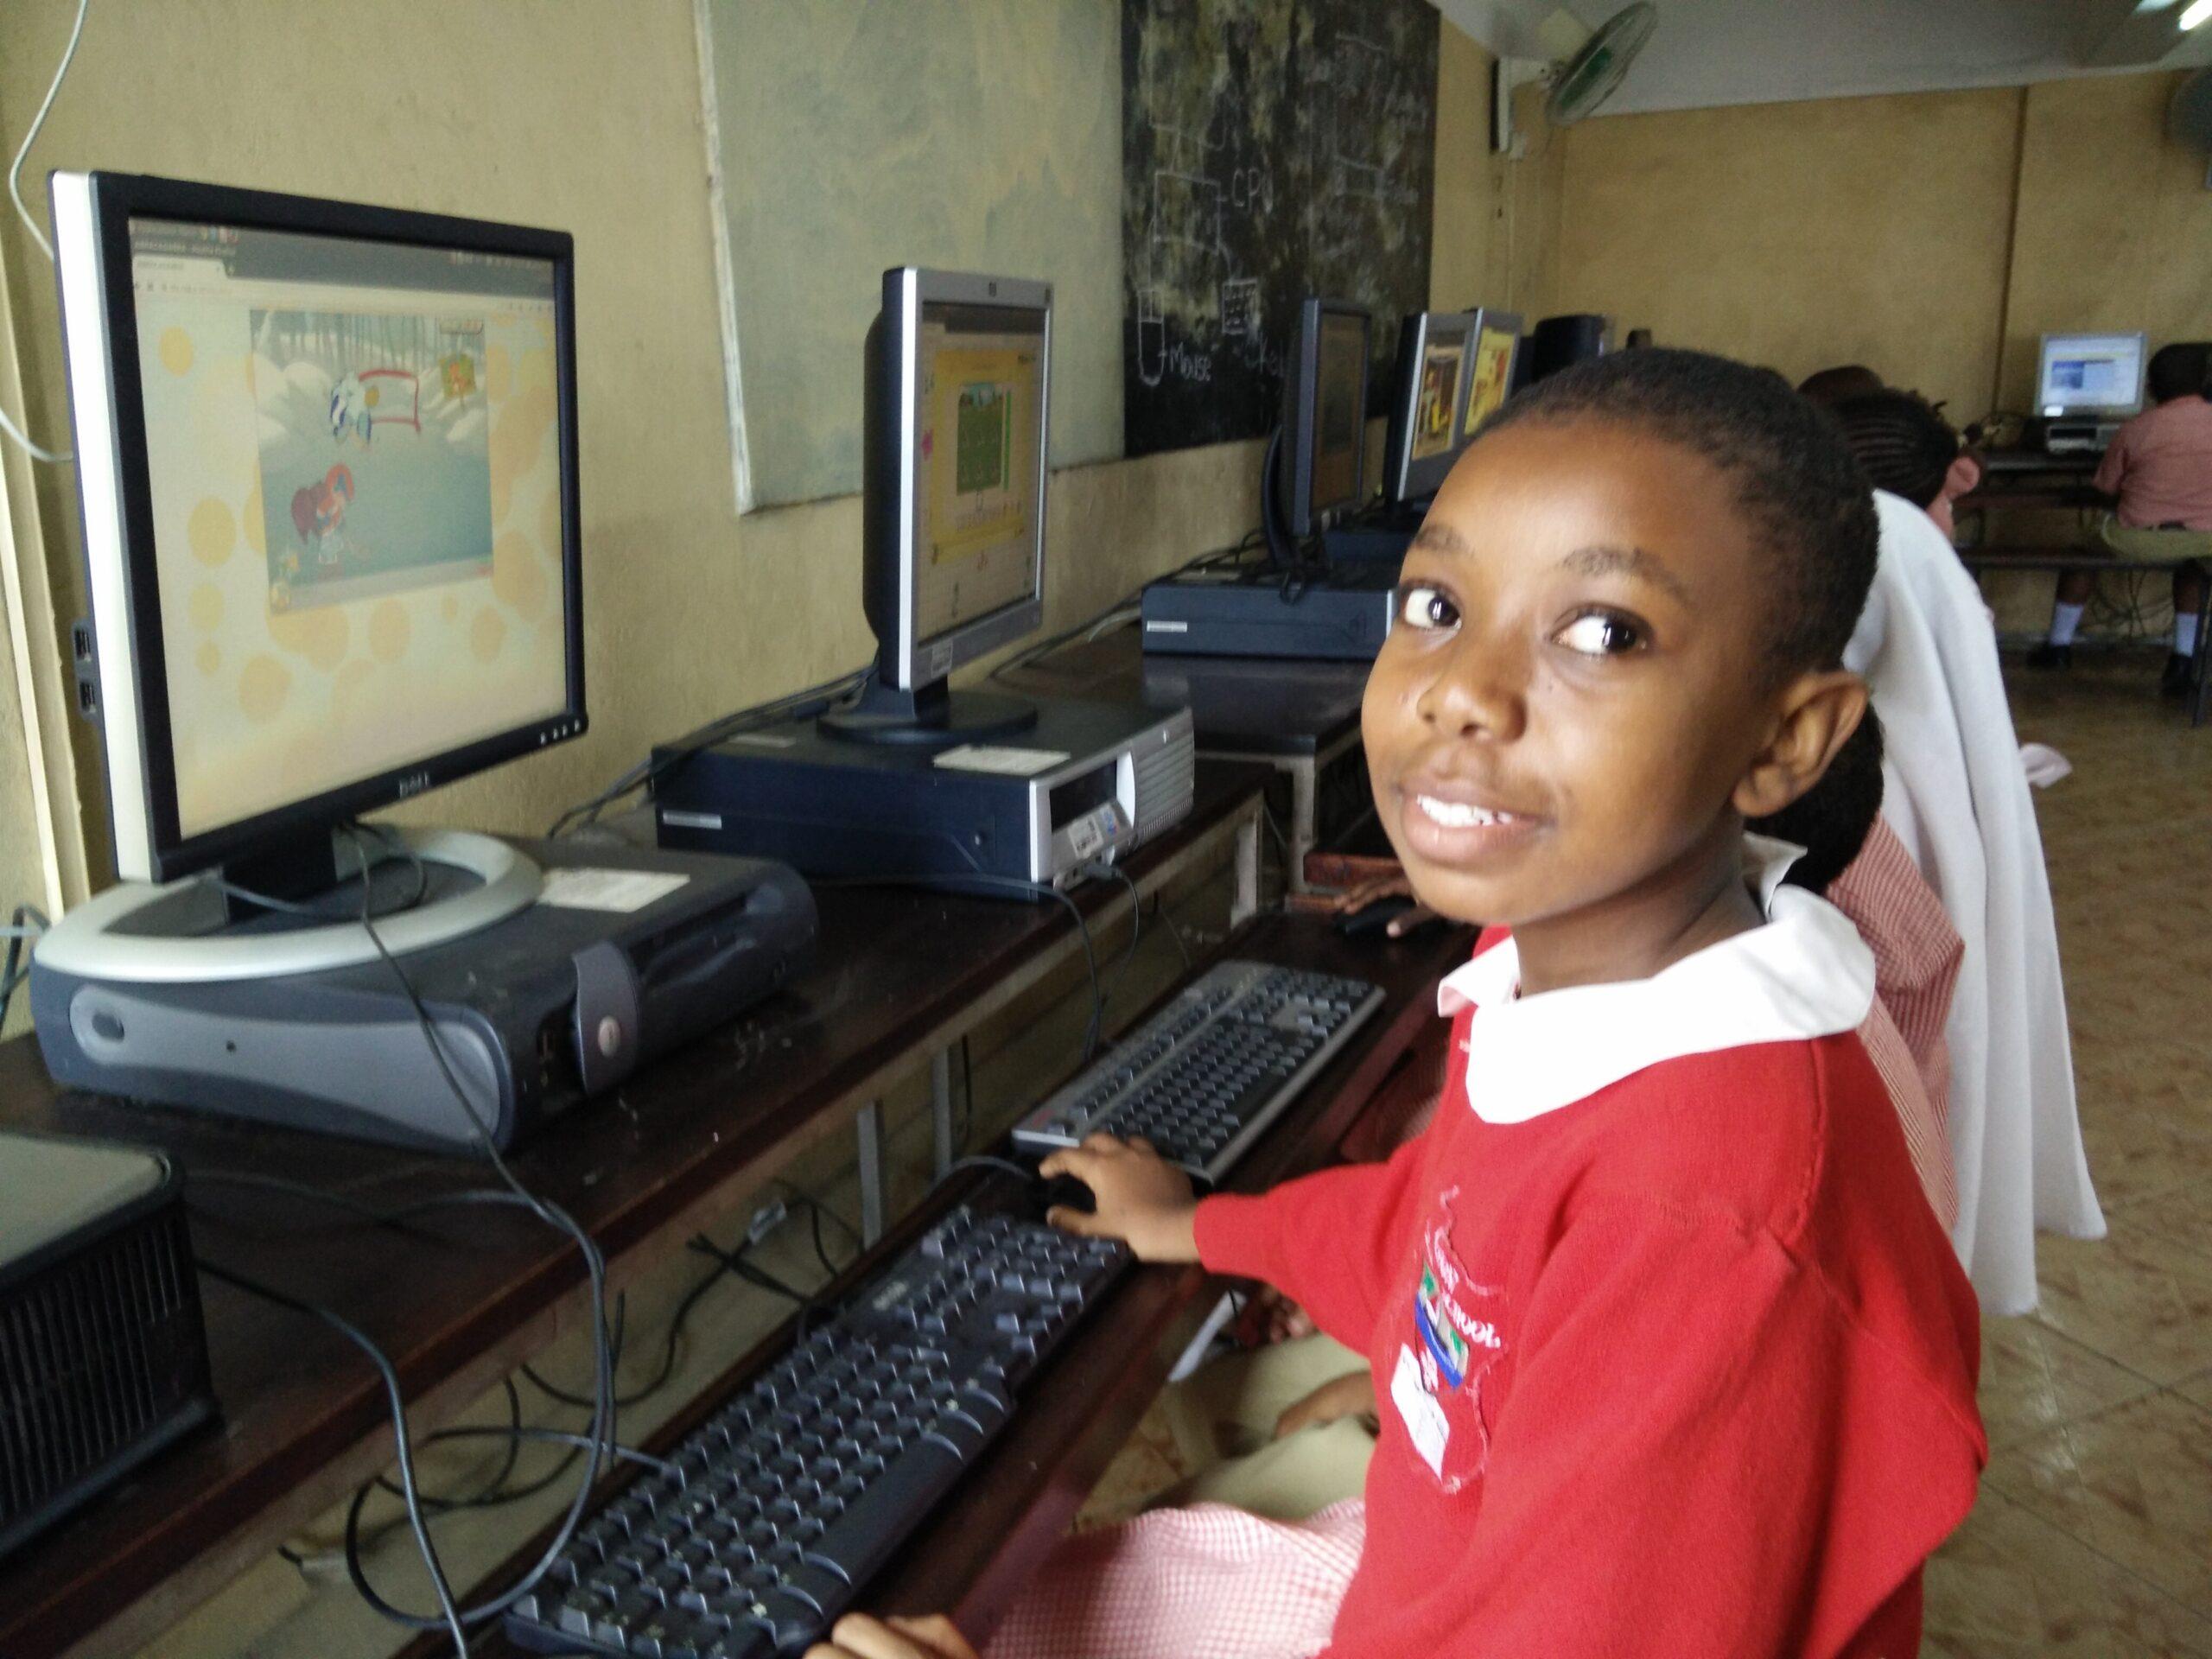 Patience Kamuche from Ganjoni Primary School, Millionth Digital Literate Child